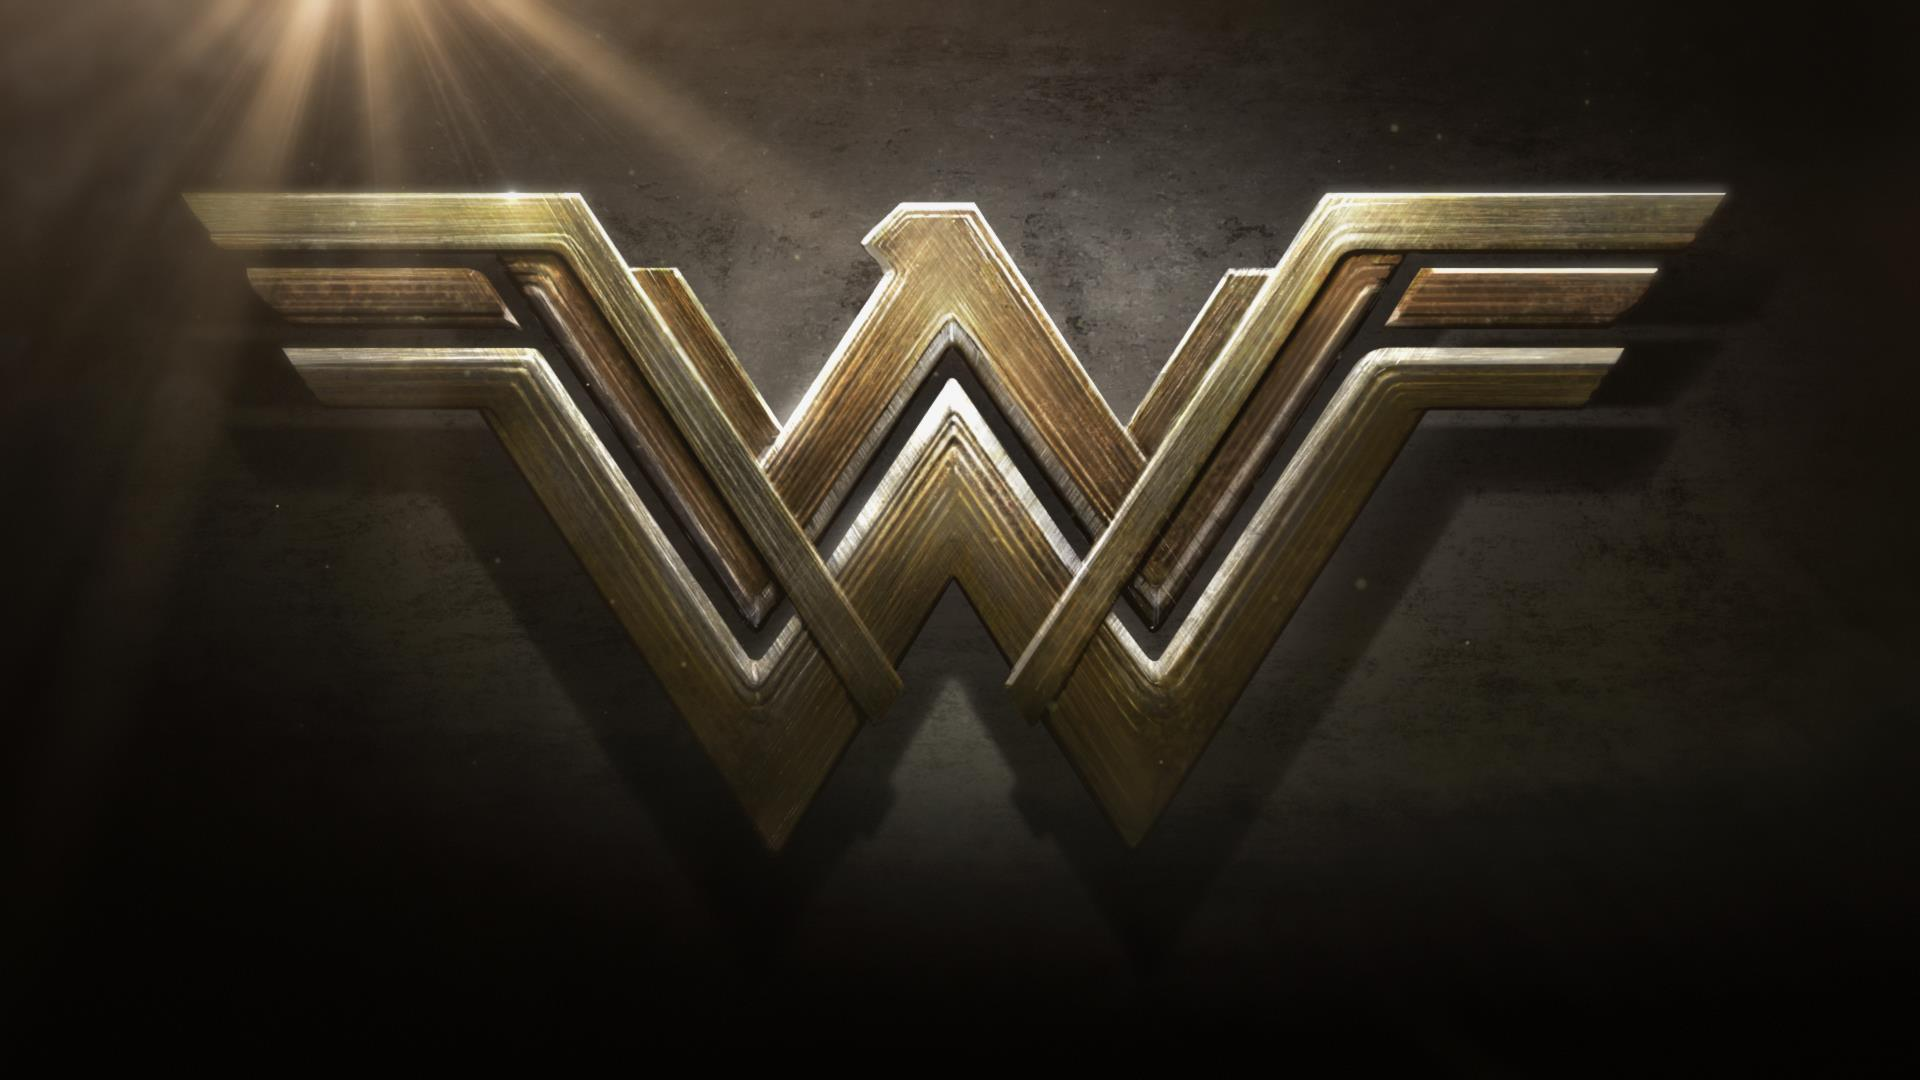 Wonder Woman: Gal Gadot bellissima nella nuova immagine di Entertainment Weekly